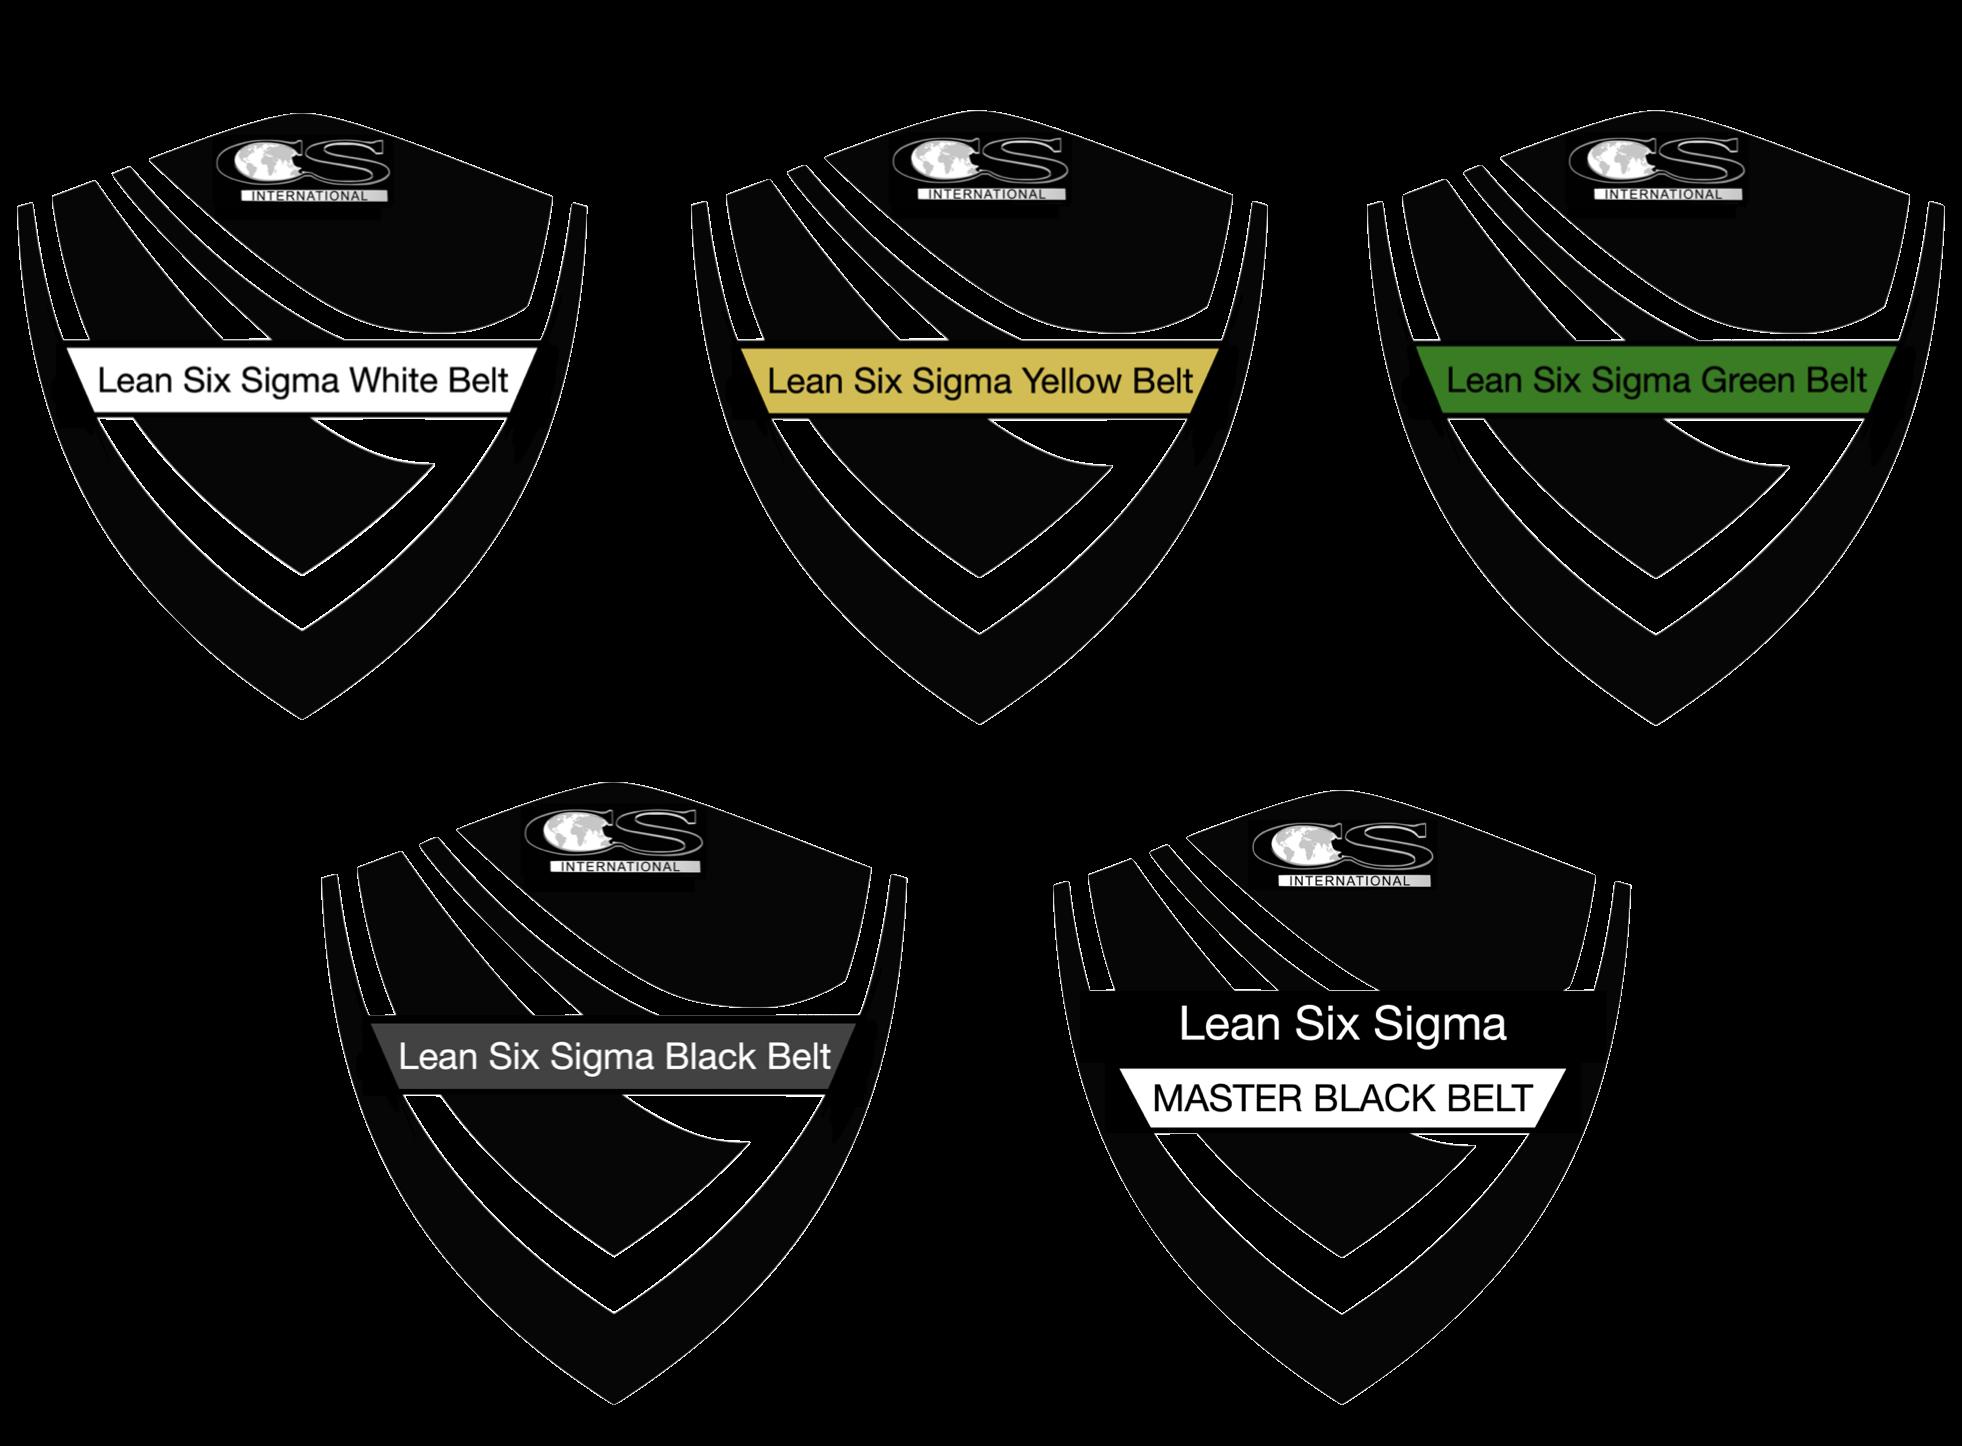 All Lean Six Sigma Belts Final Logos